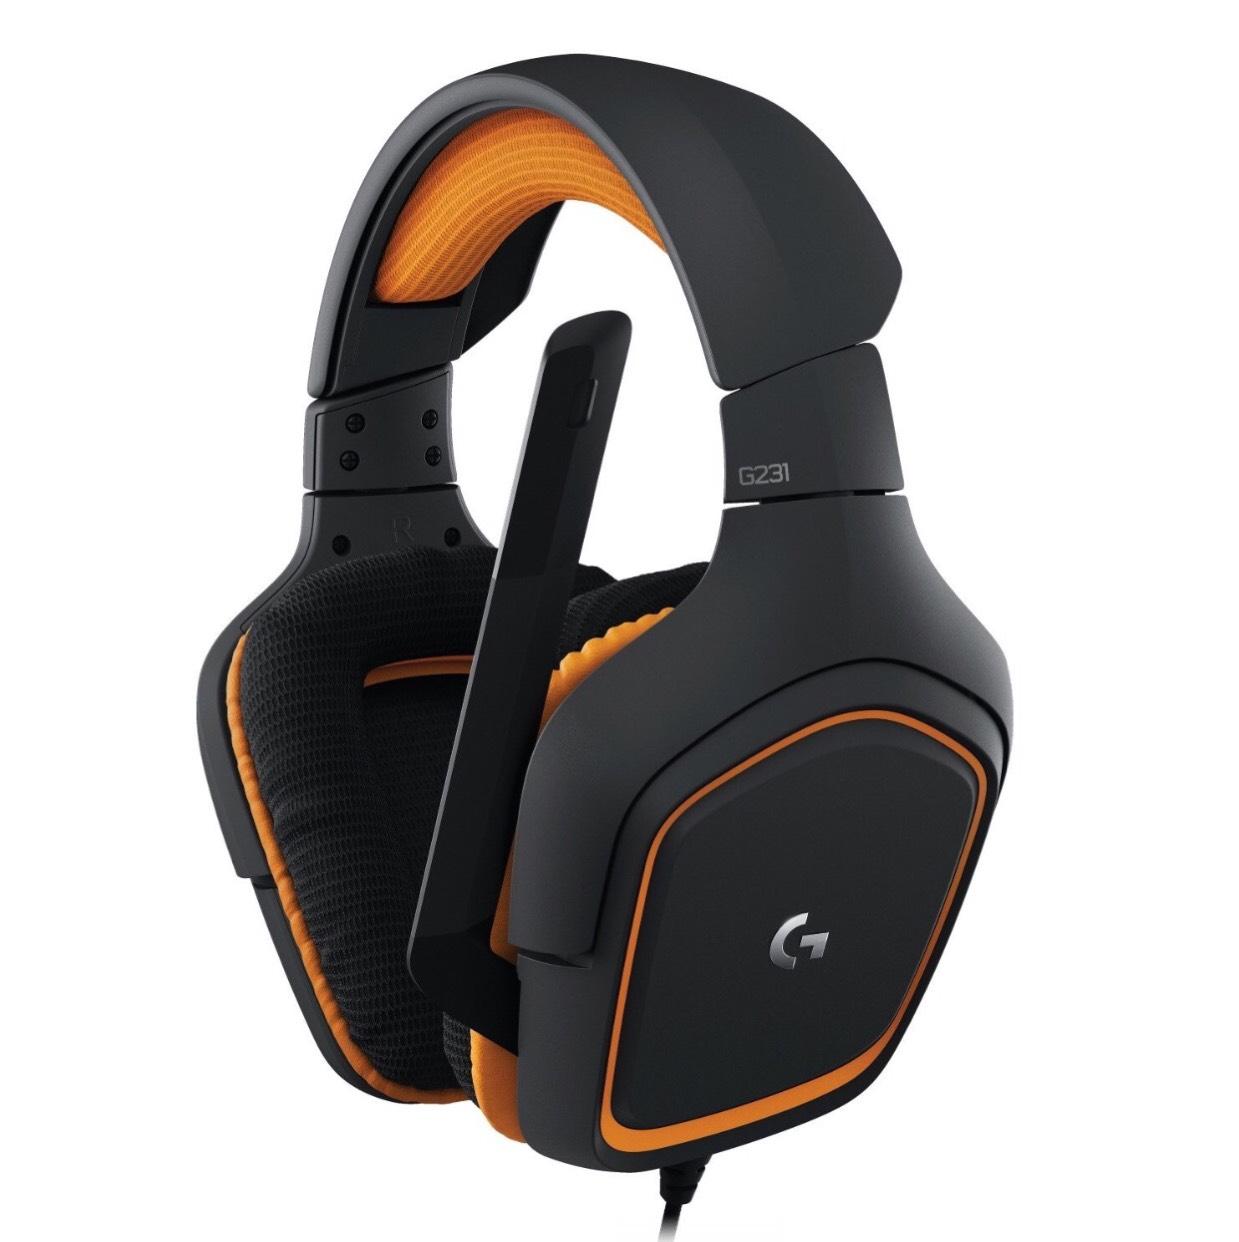 [amazon.de] Logitech G231 Prodigy-Gaming / Stereo Kopfhörer / Mikrofon (für PC, Xbox und PS4) Schwarz/Orange Angebot 37,49 €!!